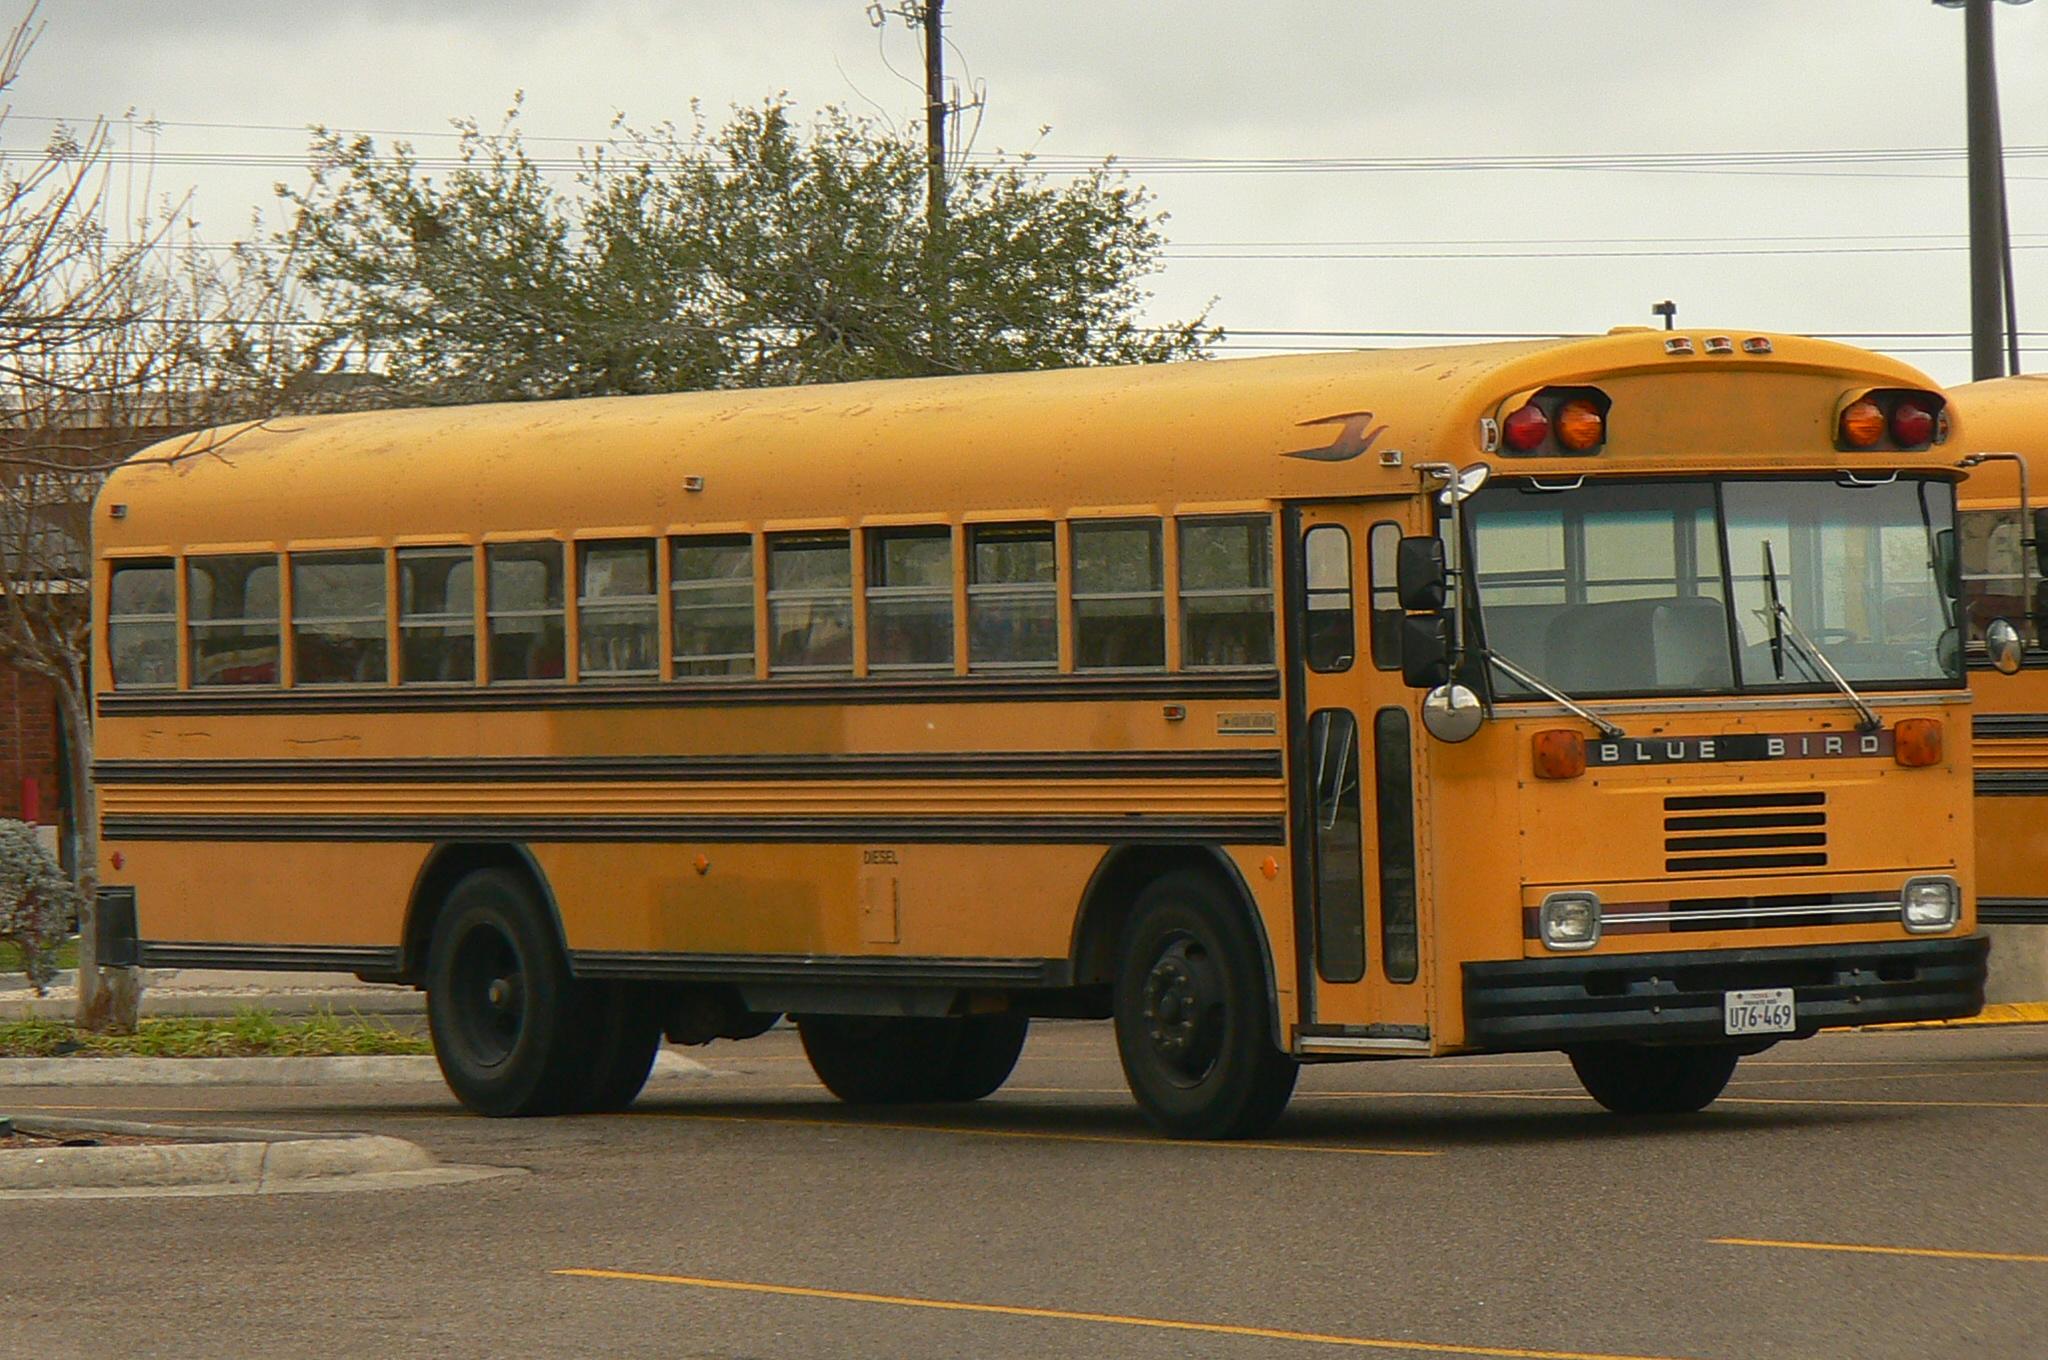 bluebird bus wiring diagram 2002 chevy cavalier engine thomas hdx school